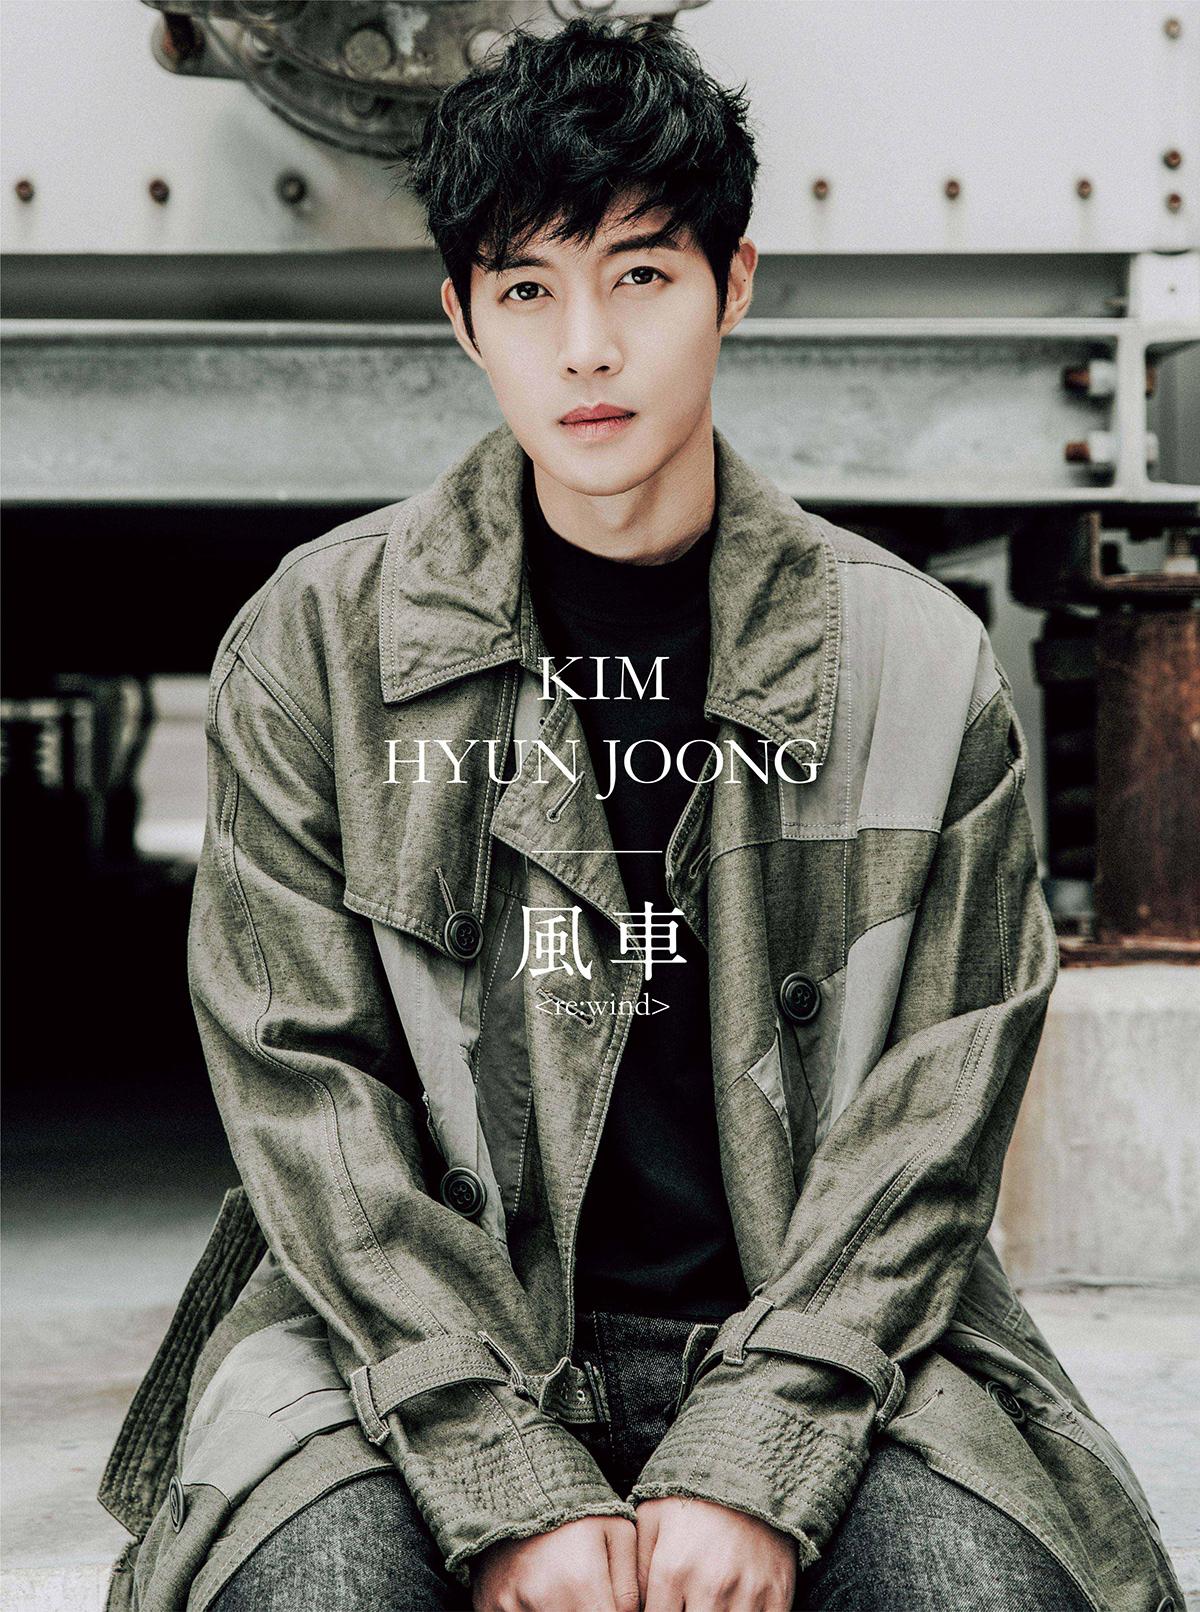 Single - Kim Hyun Joong rewind Album